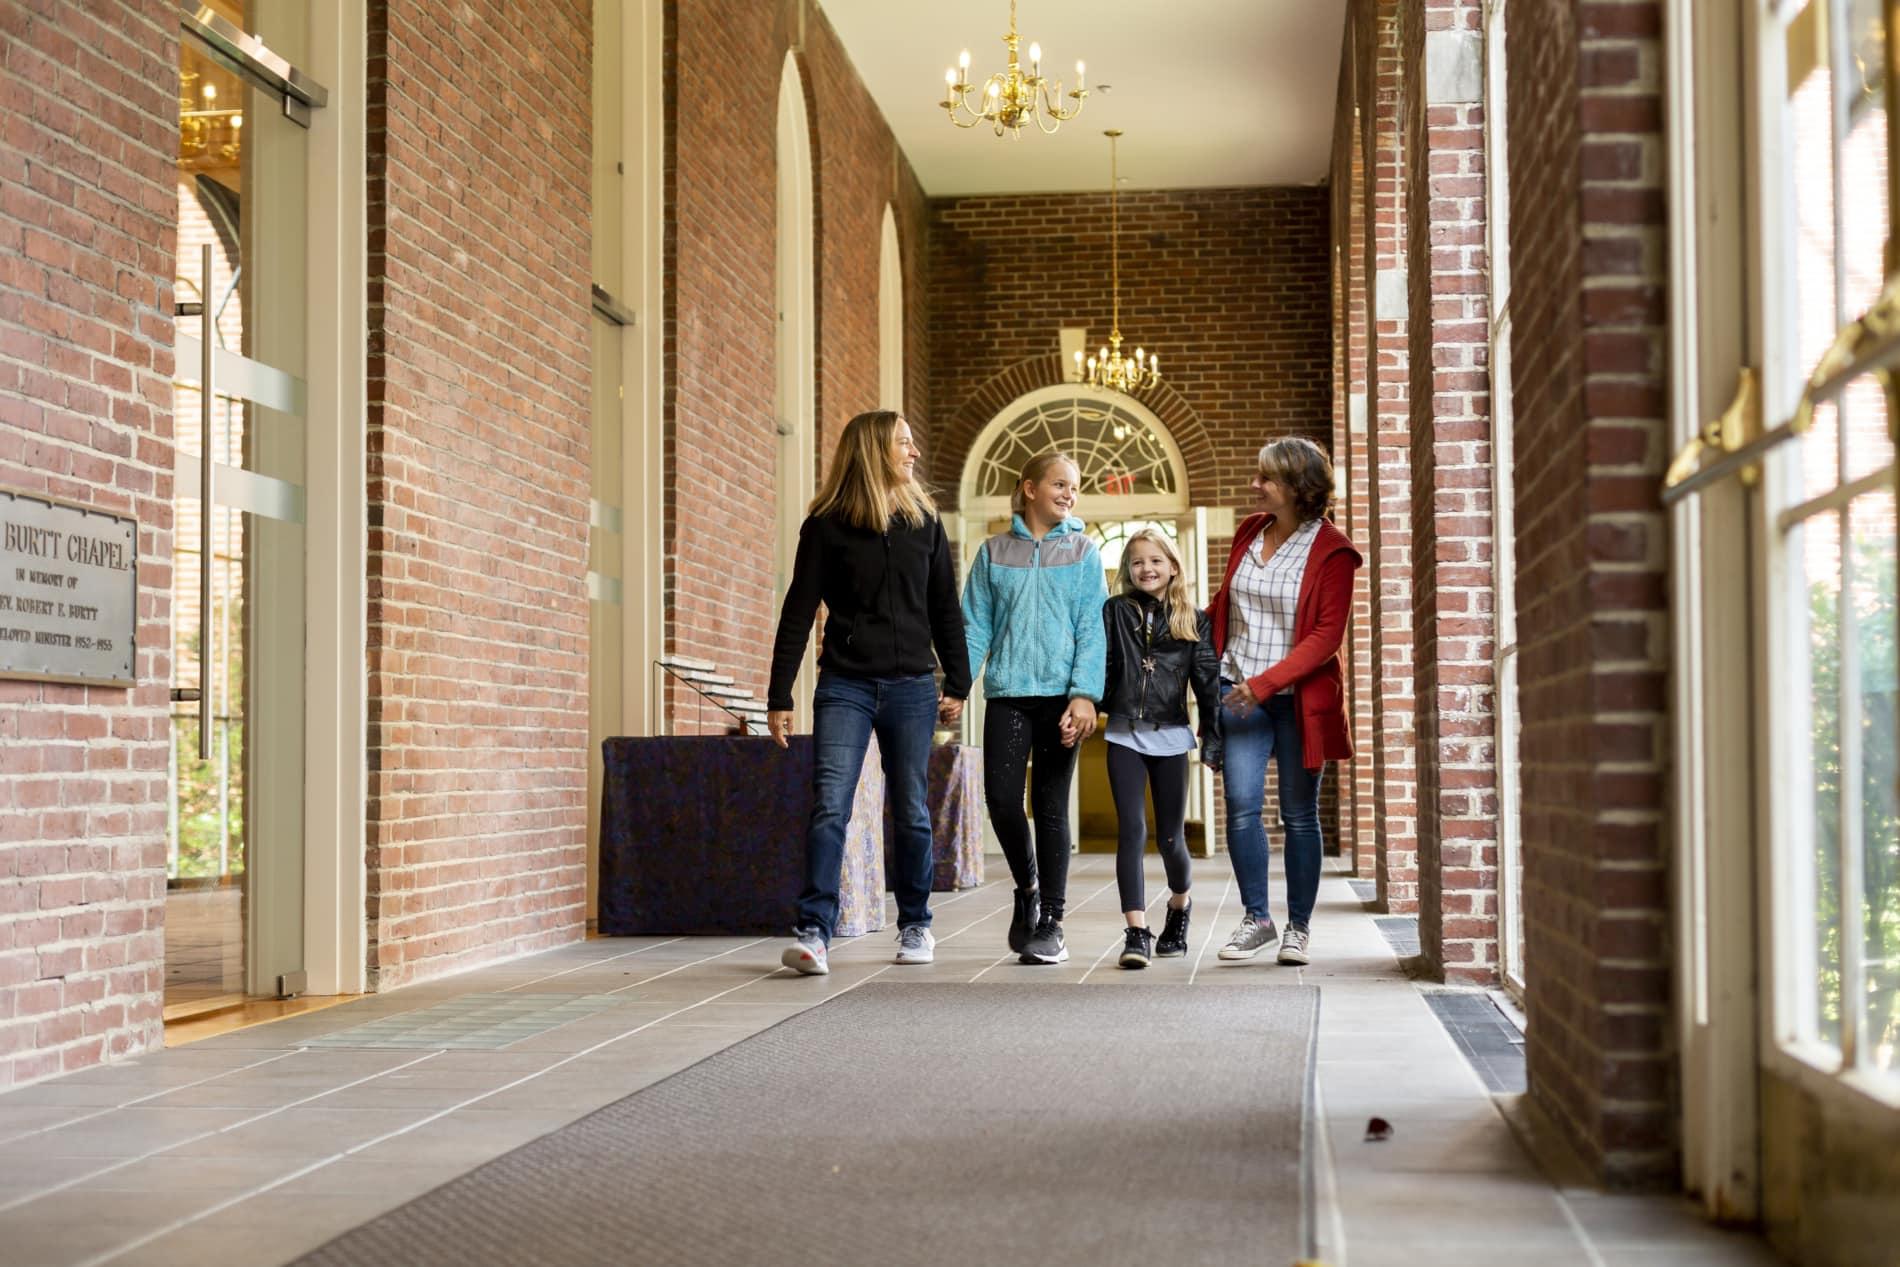 Family walks in church corridor toward sanctuary